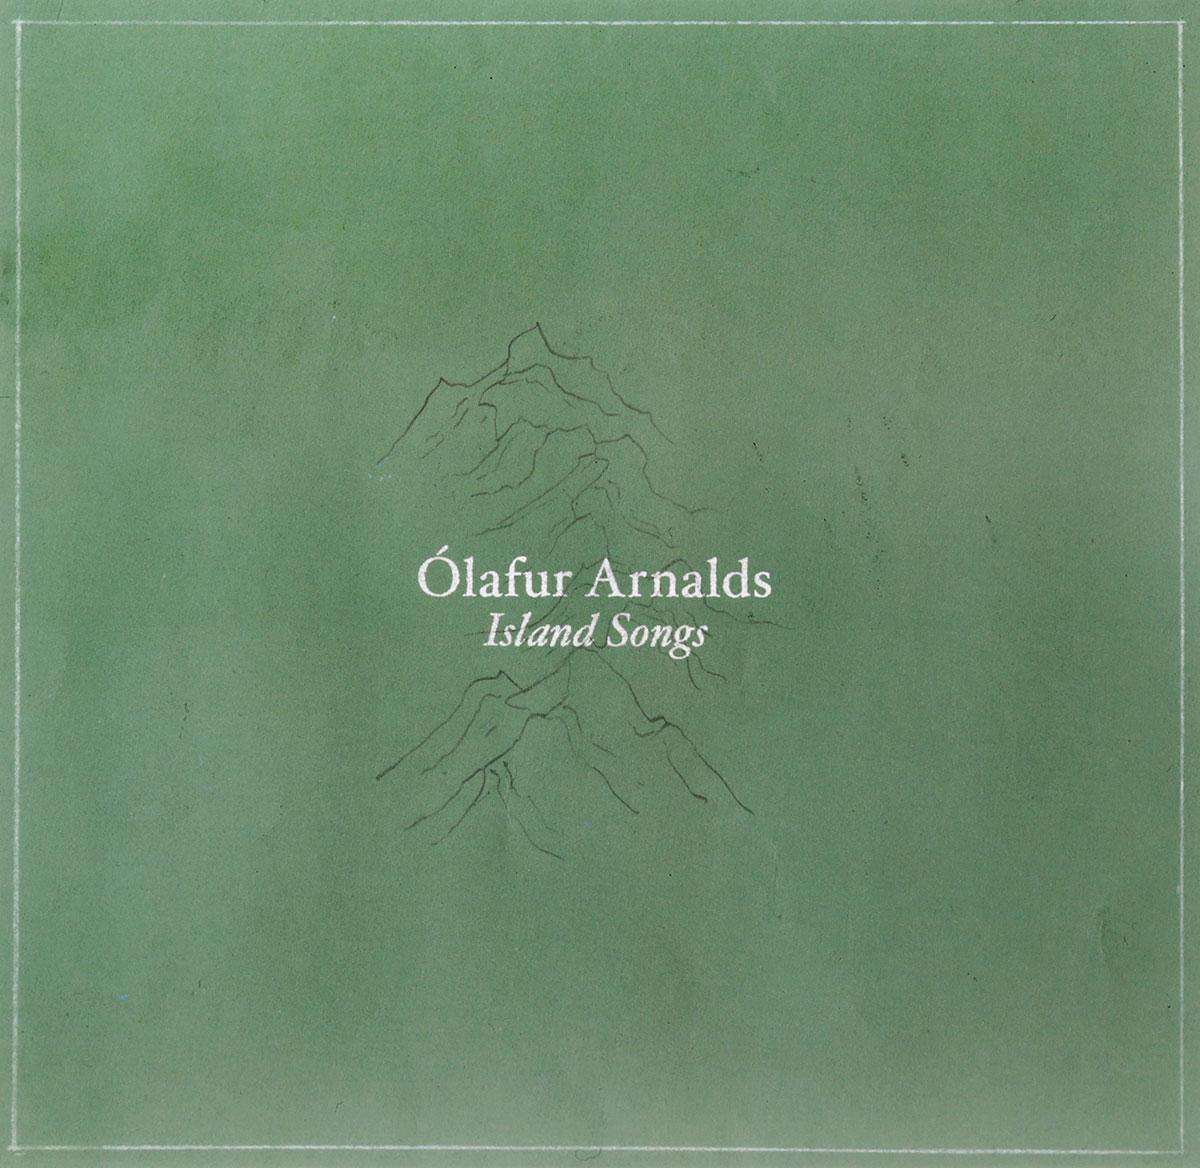 Олафур Арналдс Olafur Arnalds. Island Songs (LP) olafur arnalds broadchurch lp